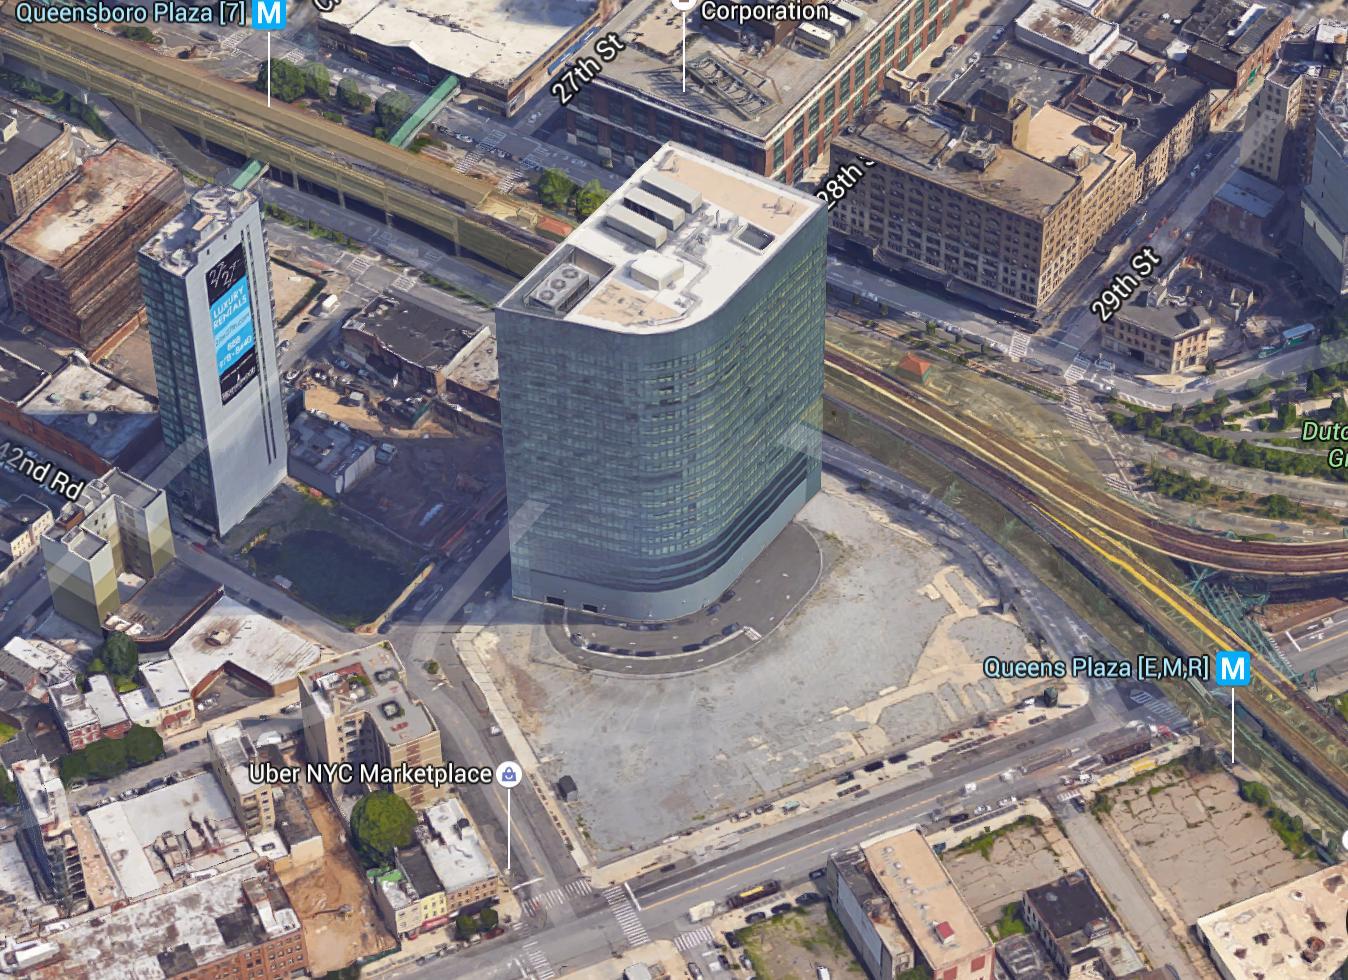 Two Gotham Center